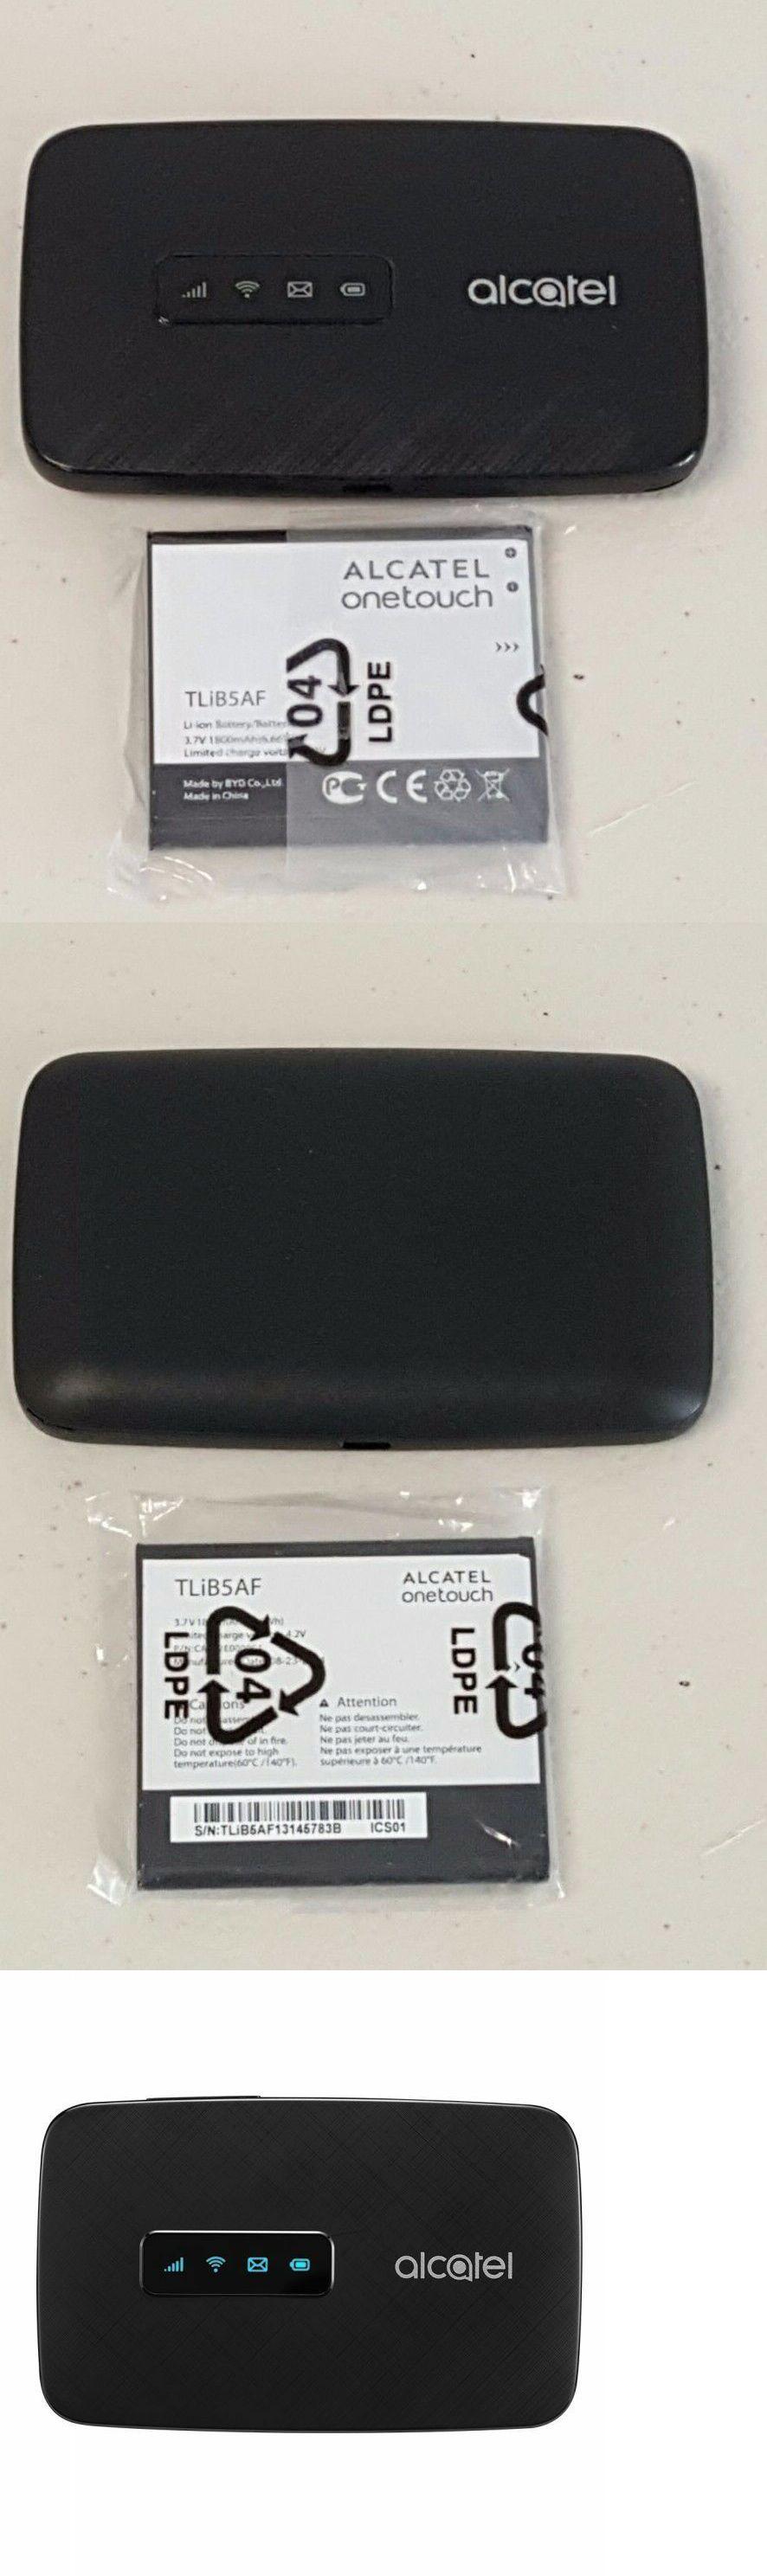 Mobile Broadband Devices 175710: Alcatel Linkzone Mw41tm T-Mobile